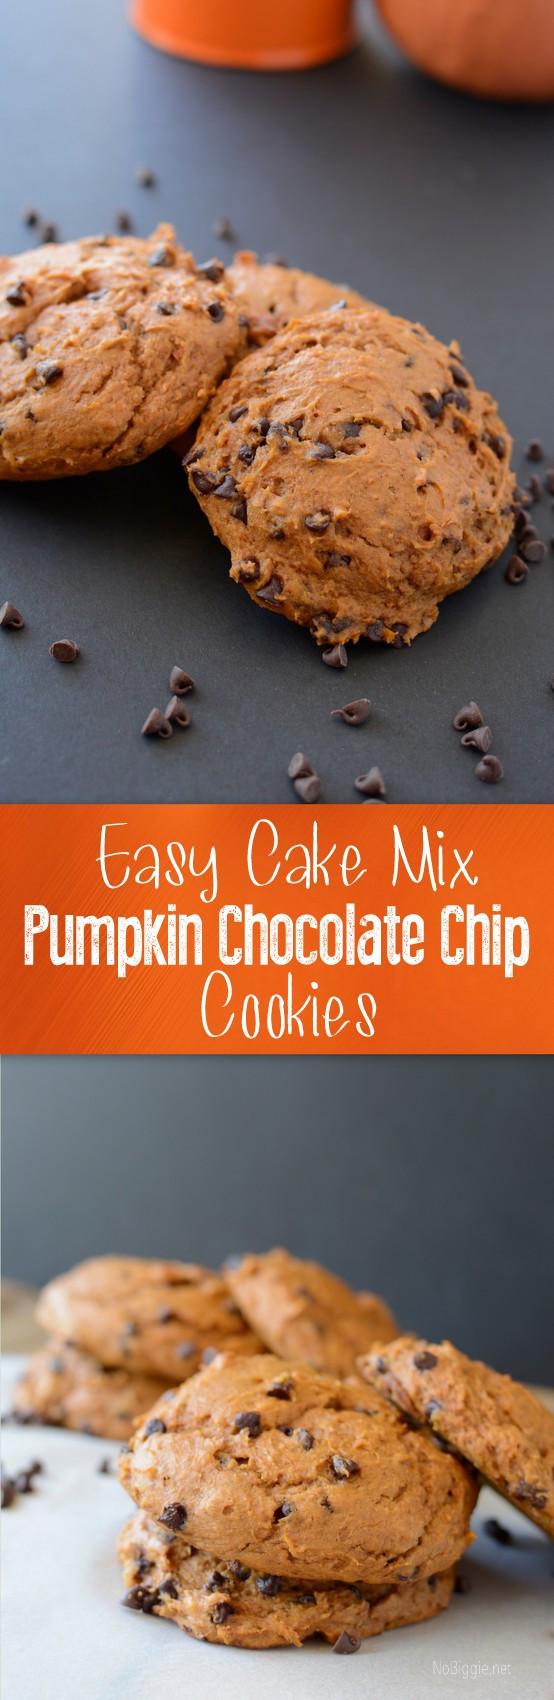 Easy Pumpkin Chocolate Chip Cookies  Easy cake mix pumpkin chocolate chip cookies